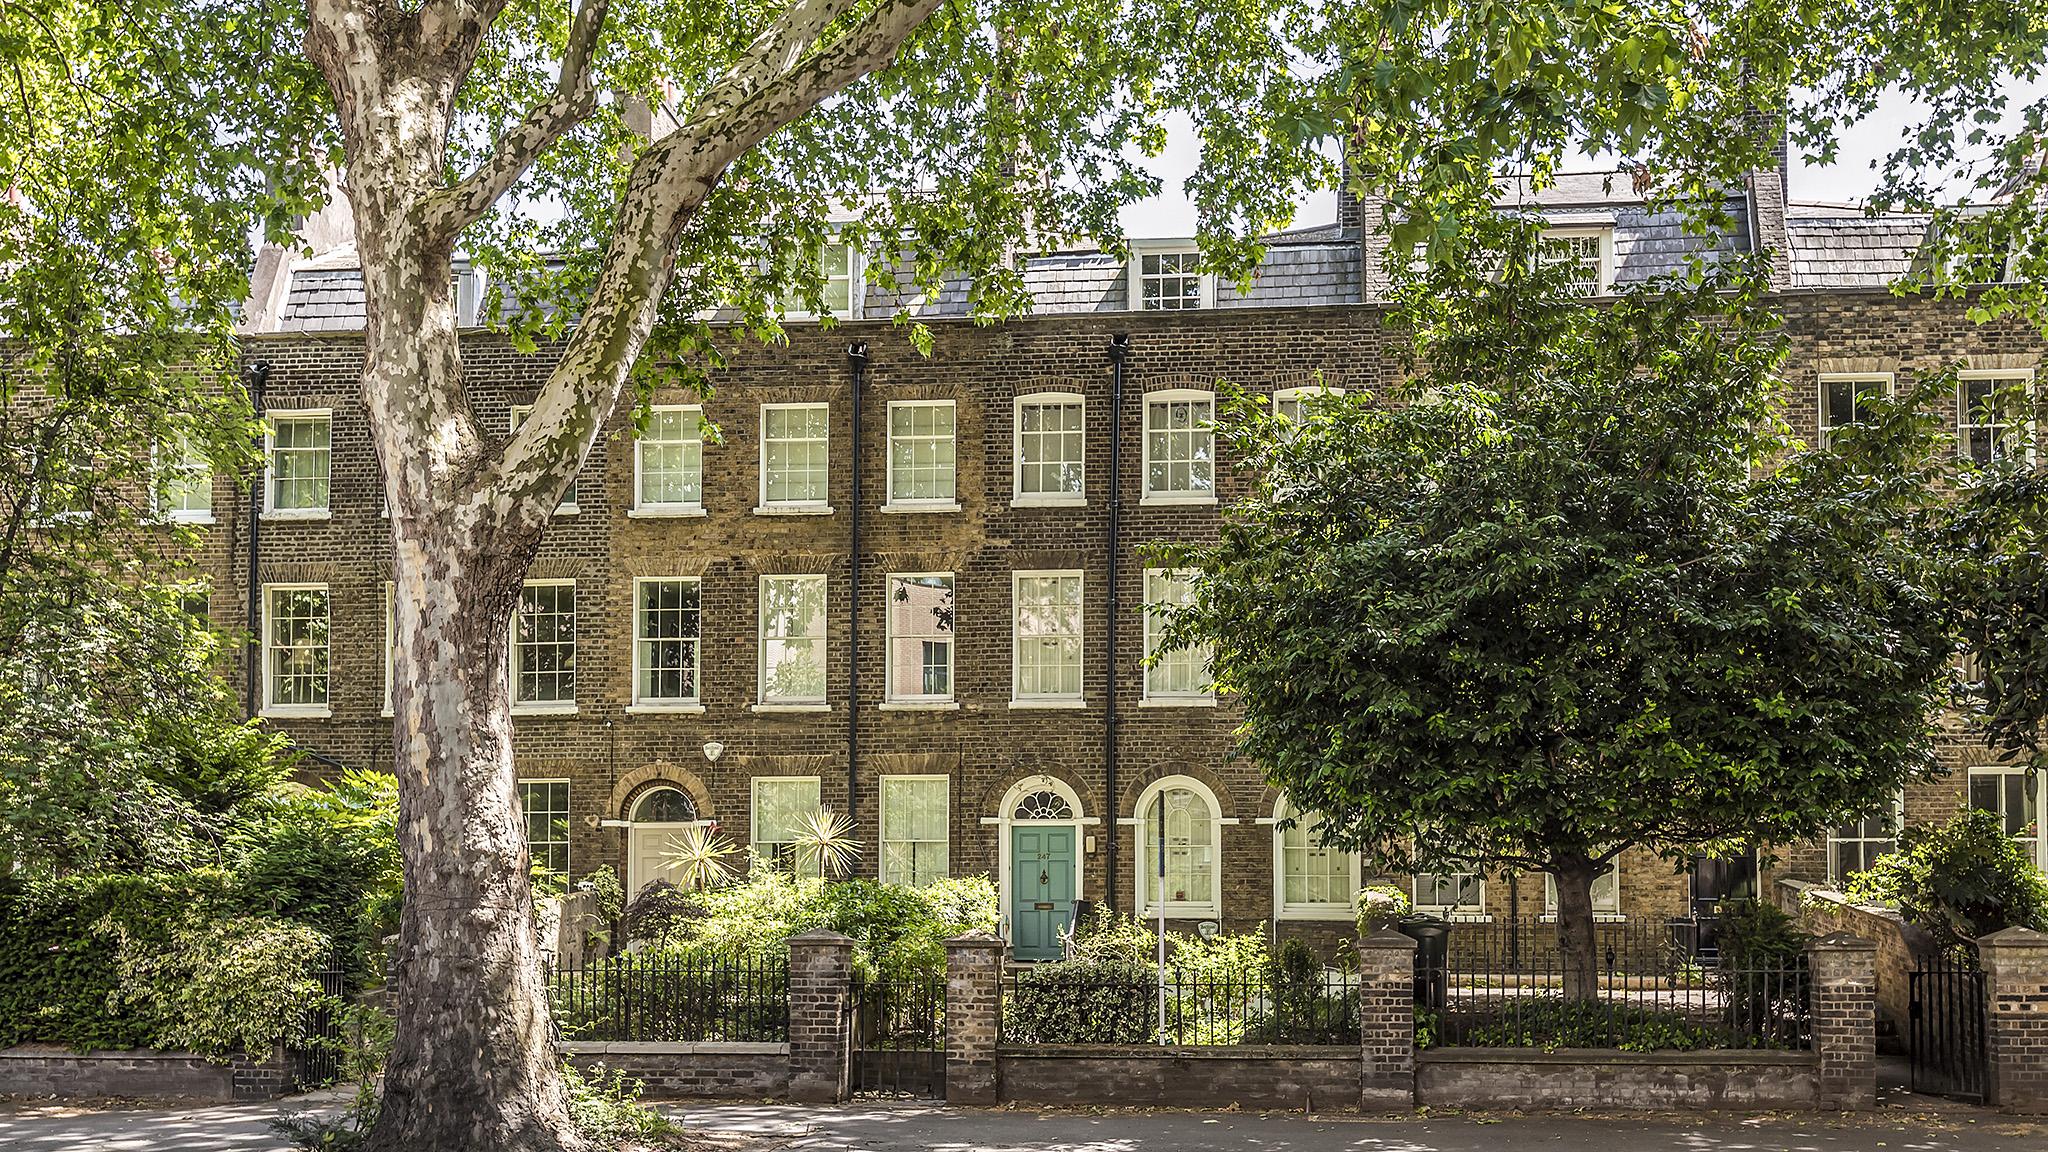 Kennington's house prices slip after rapid growth